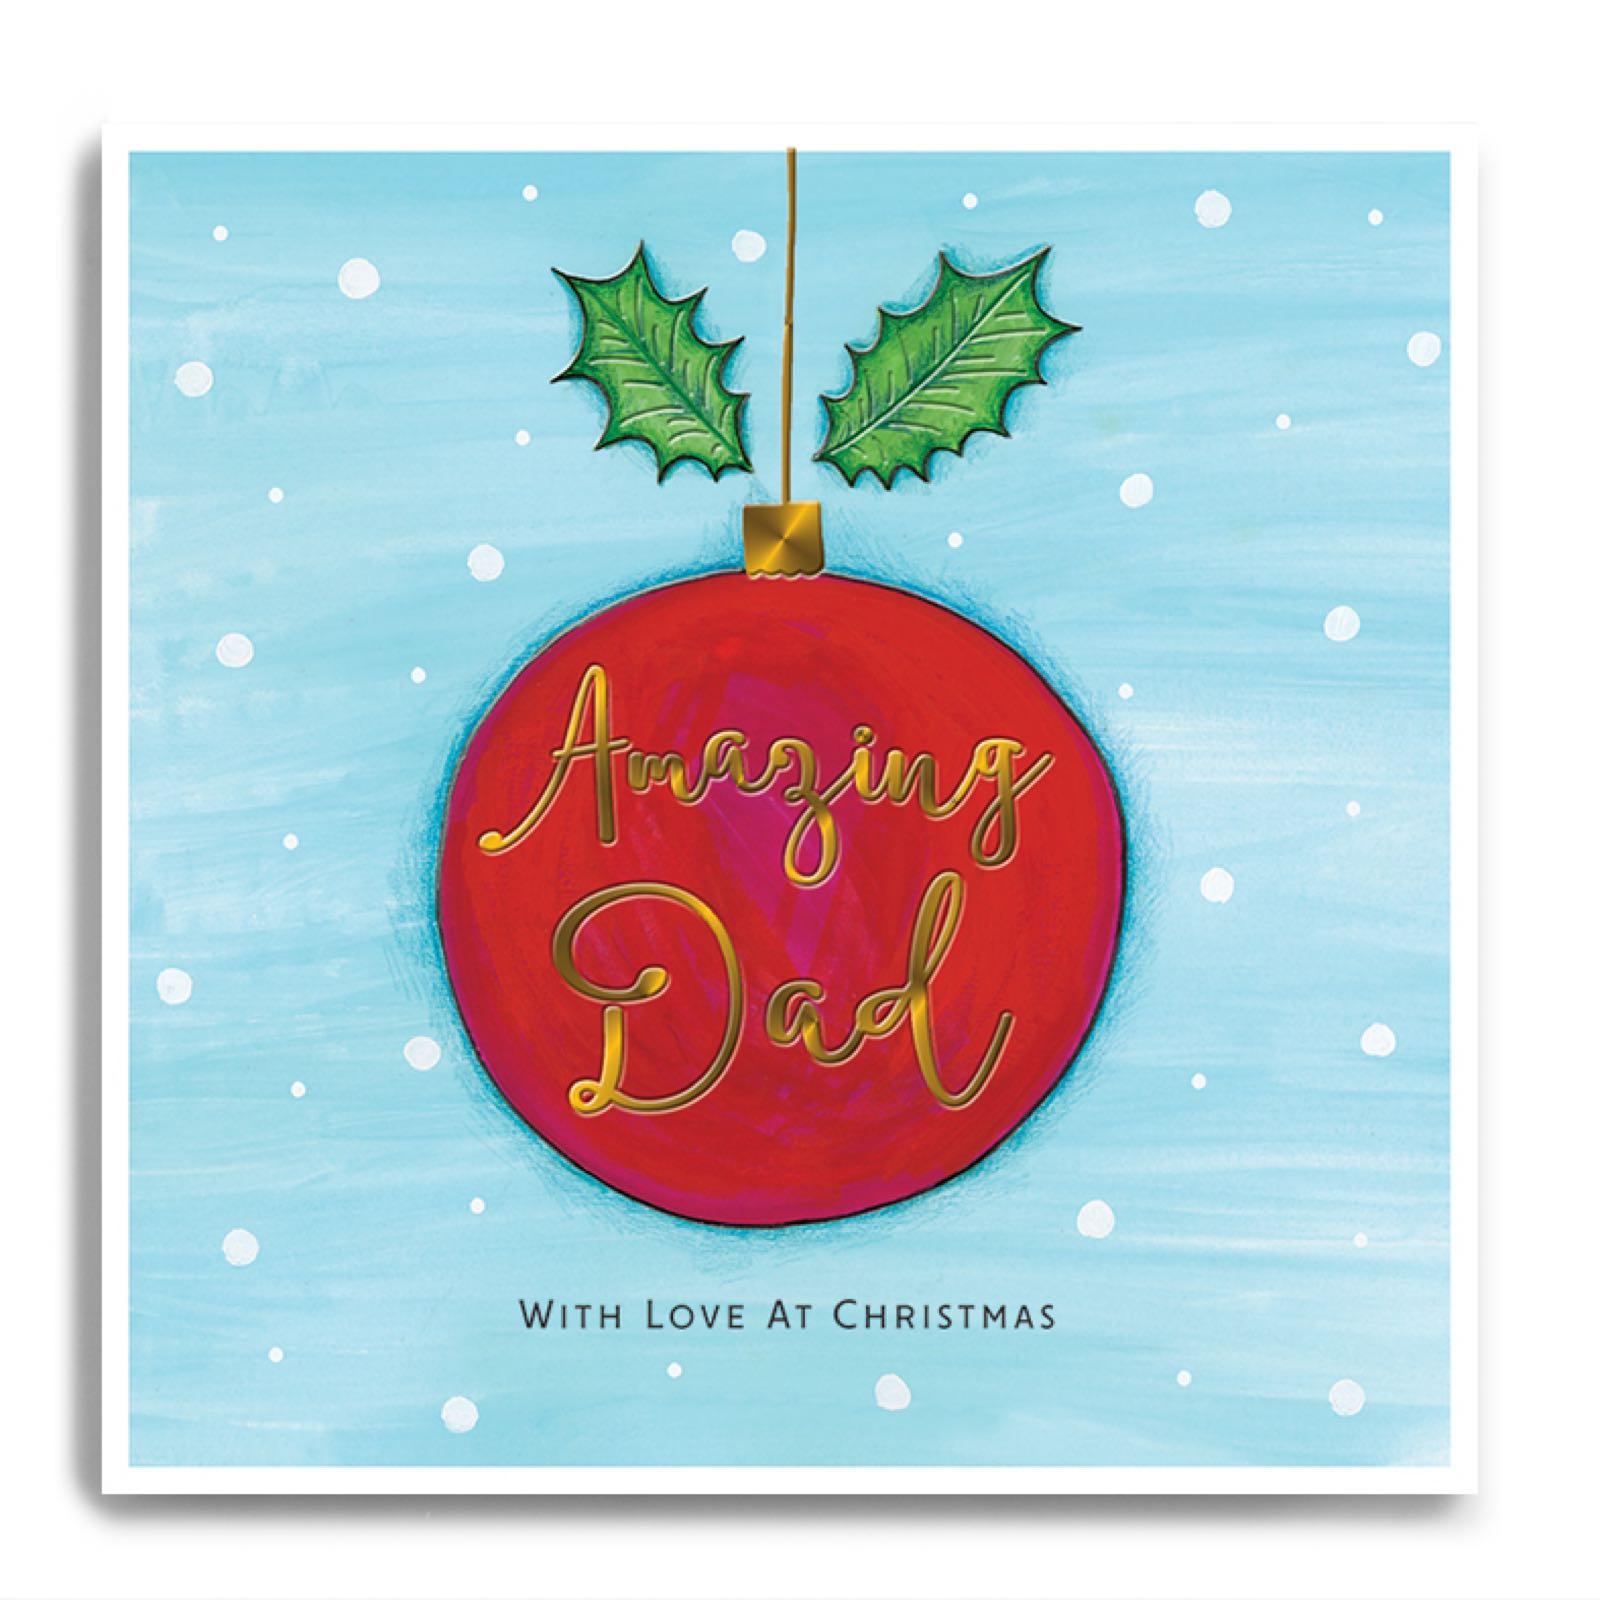 Janie wilson Amazing Dad Christmas card